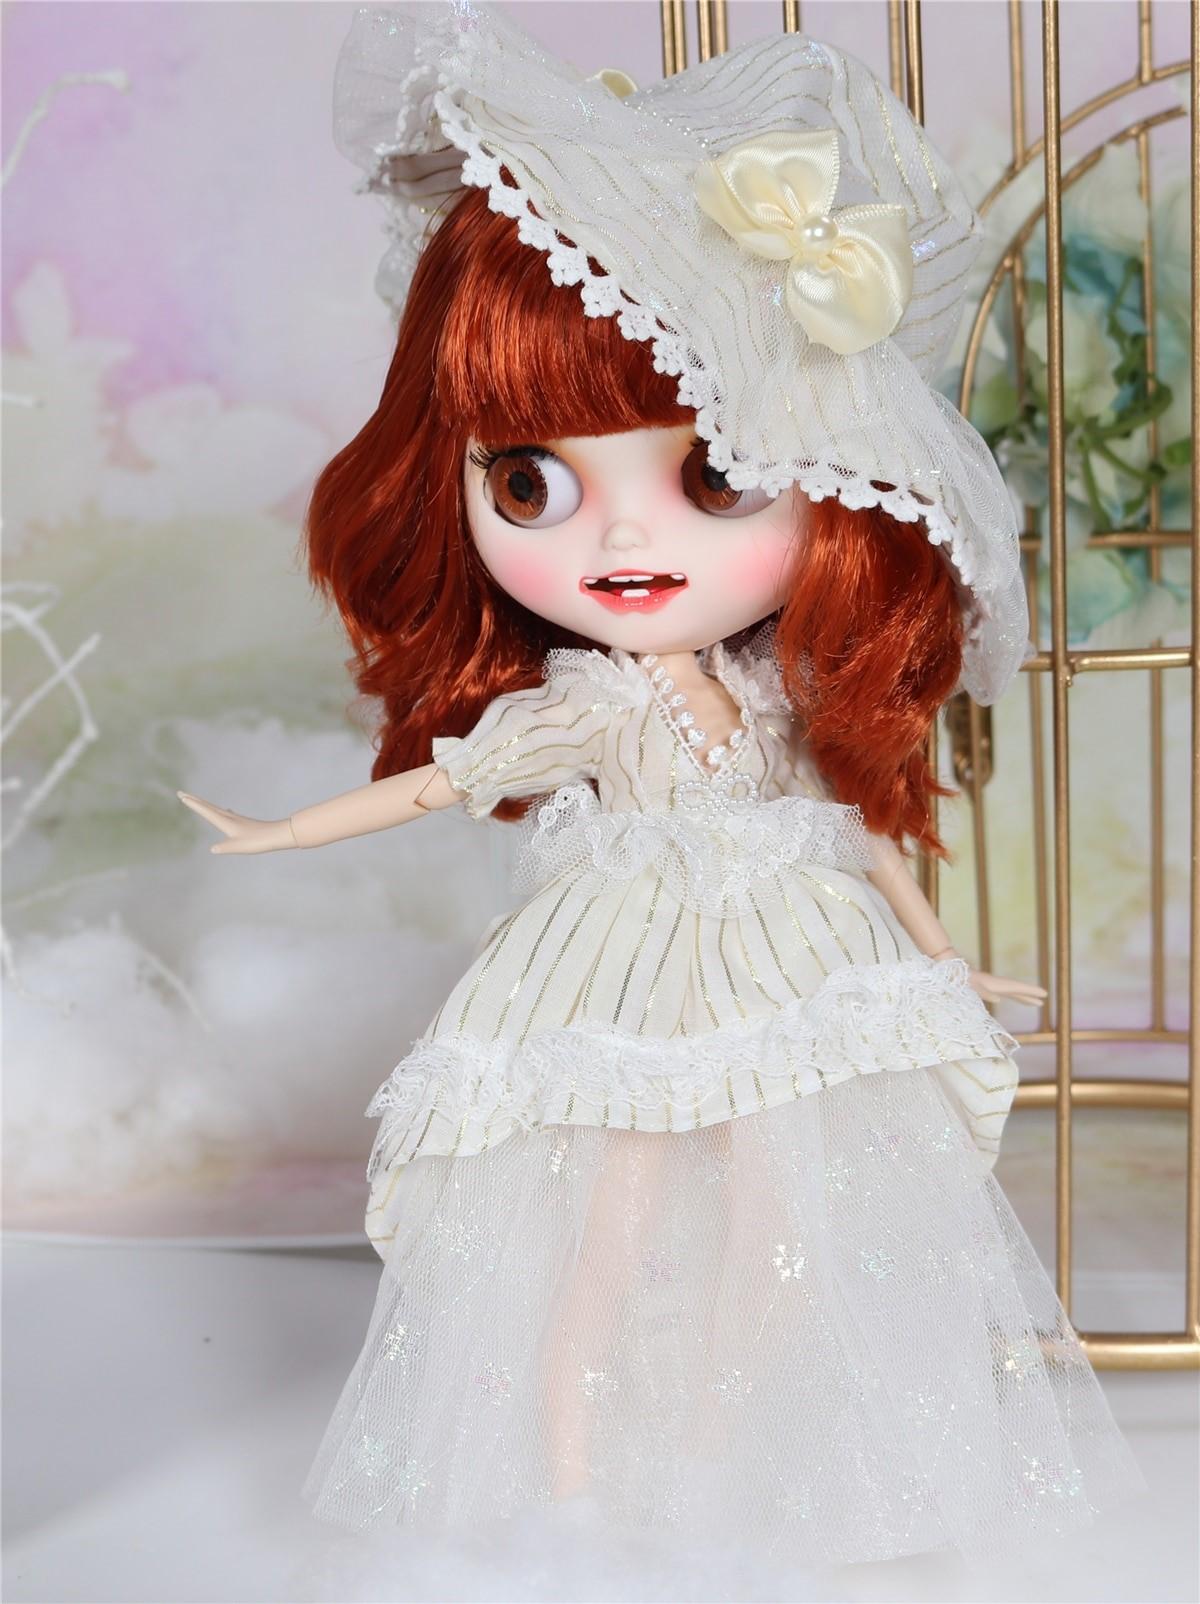 Logan – Premium Custom Blythe Doll with Clothes Smiling Face Premium Blythe Dolls 🆕 Smiling Face